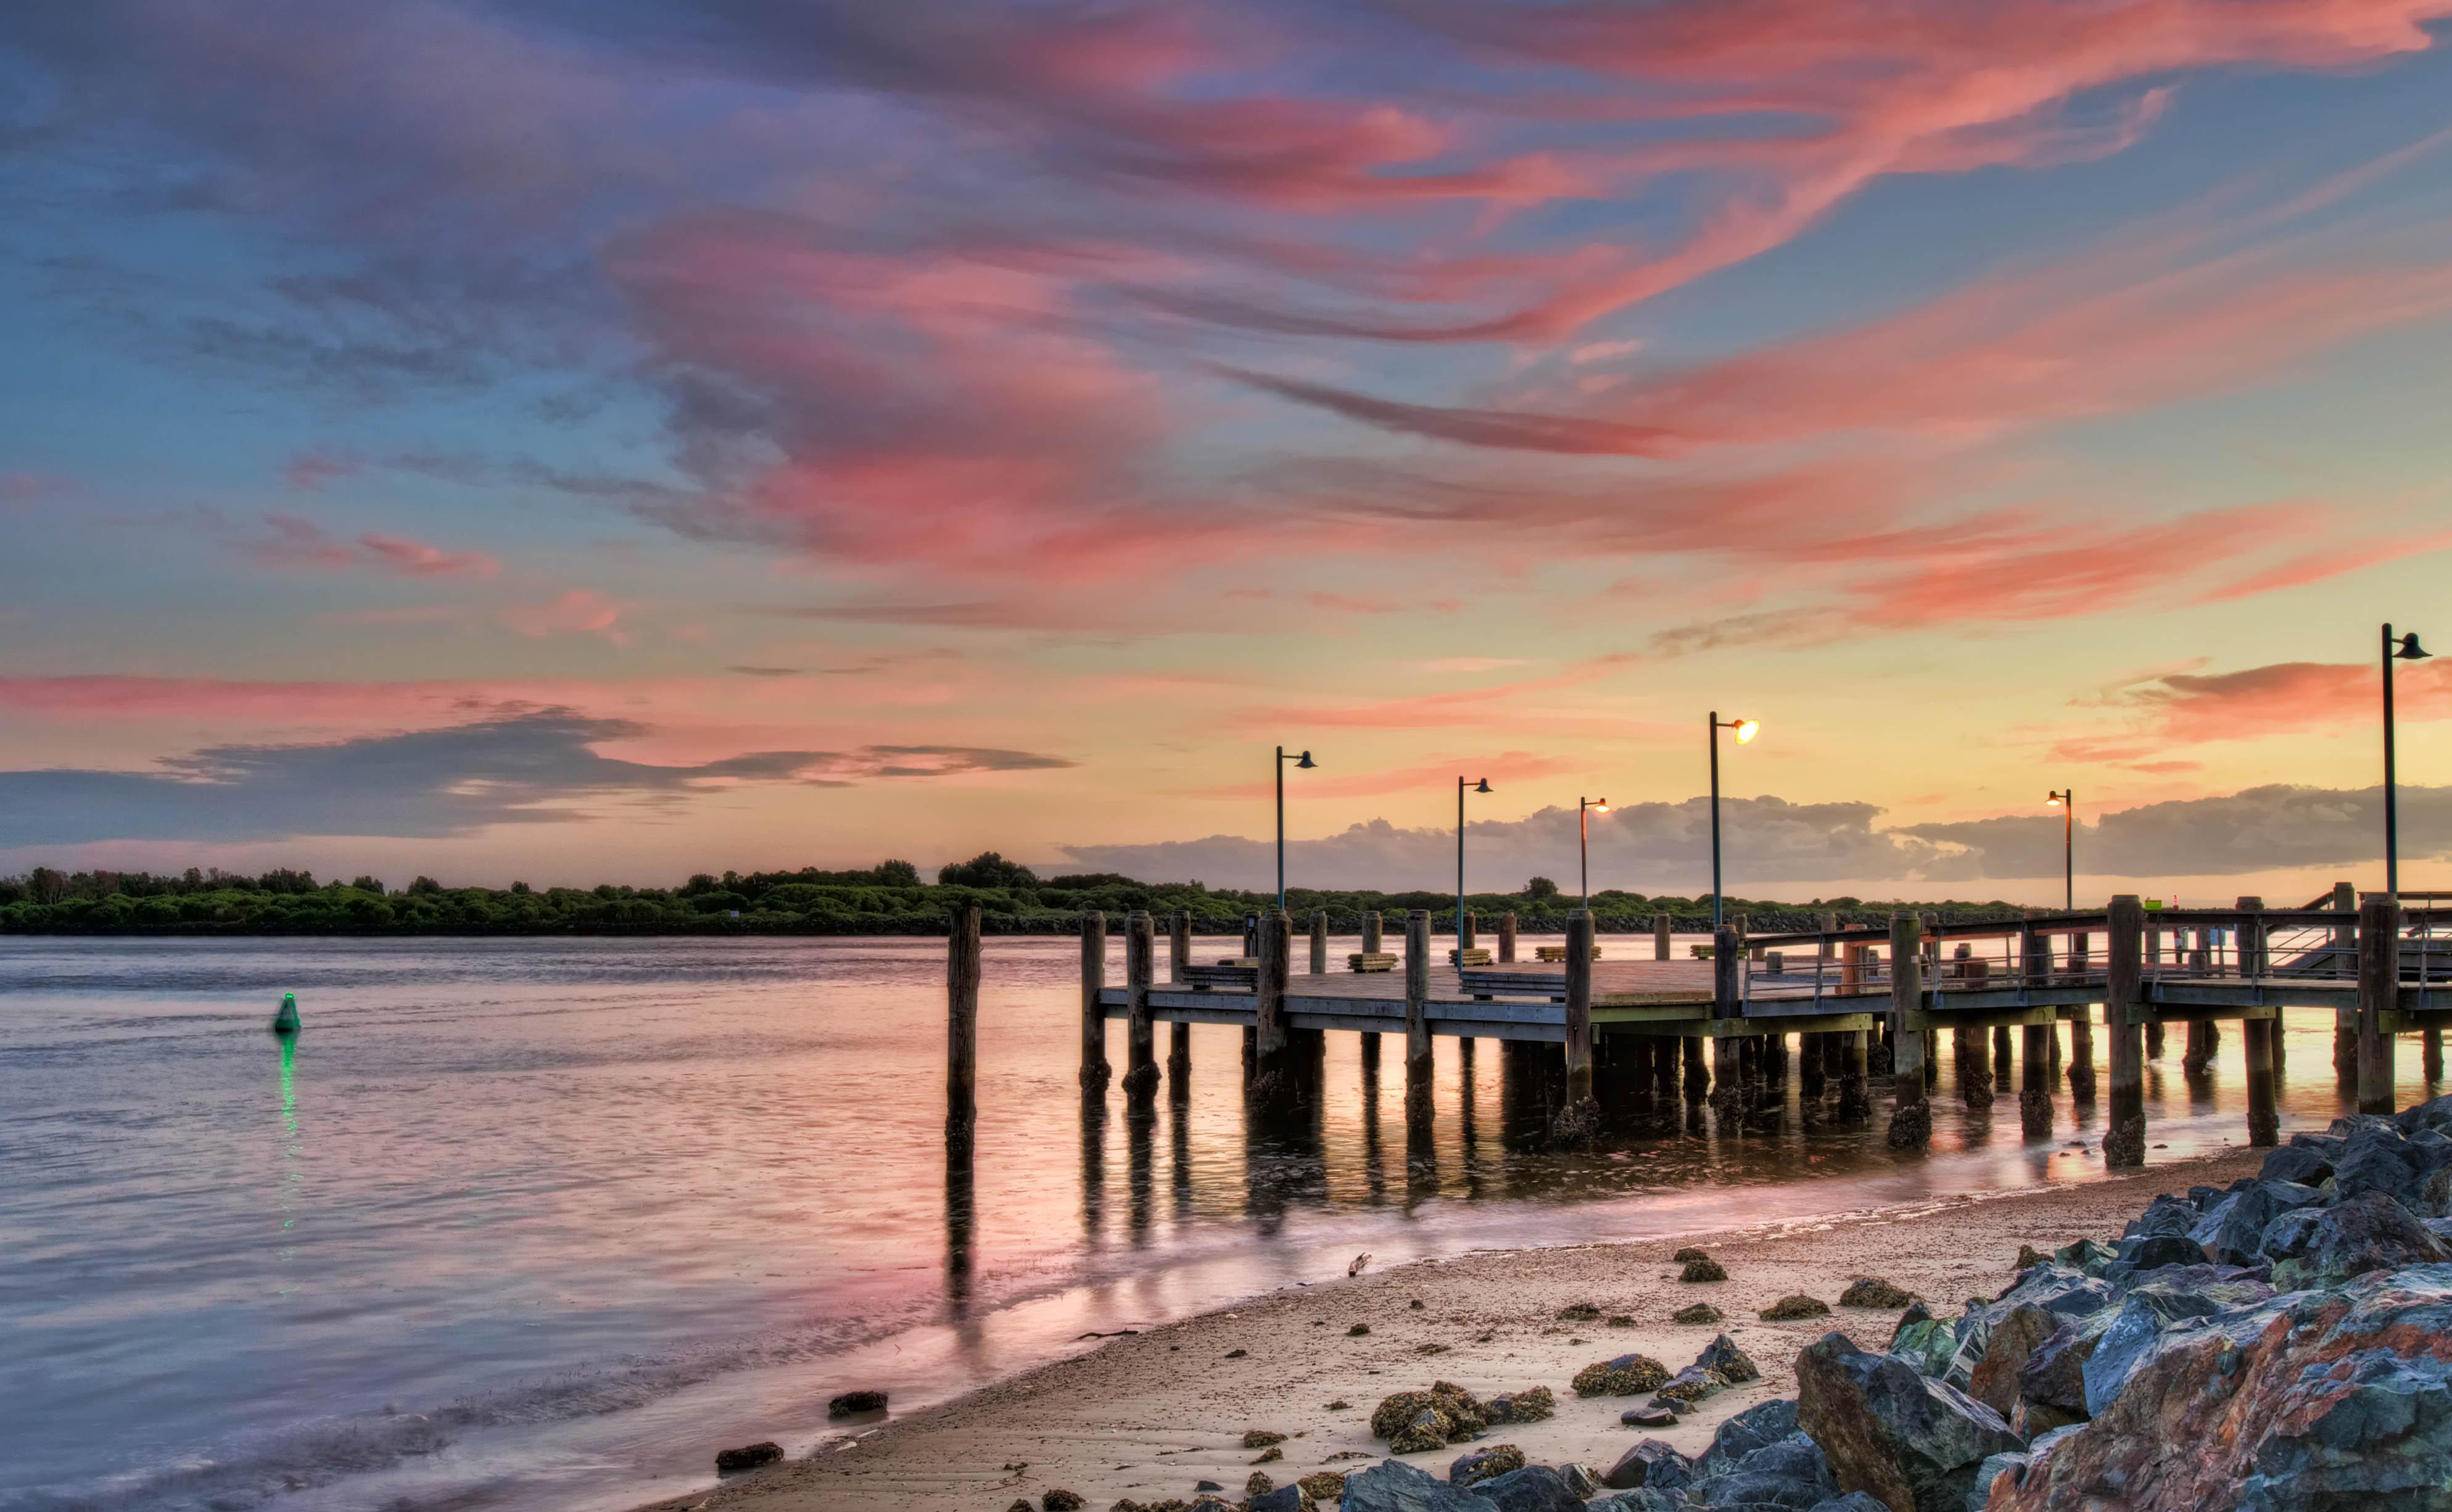 HDR Photo at Port Macquarie